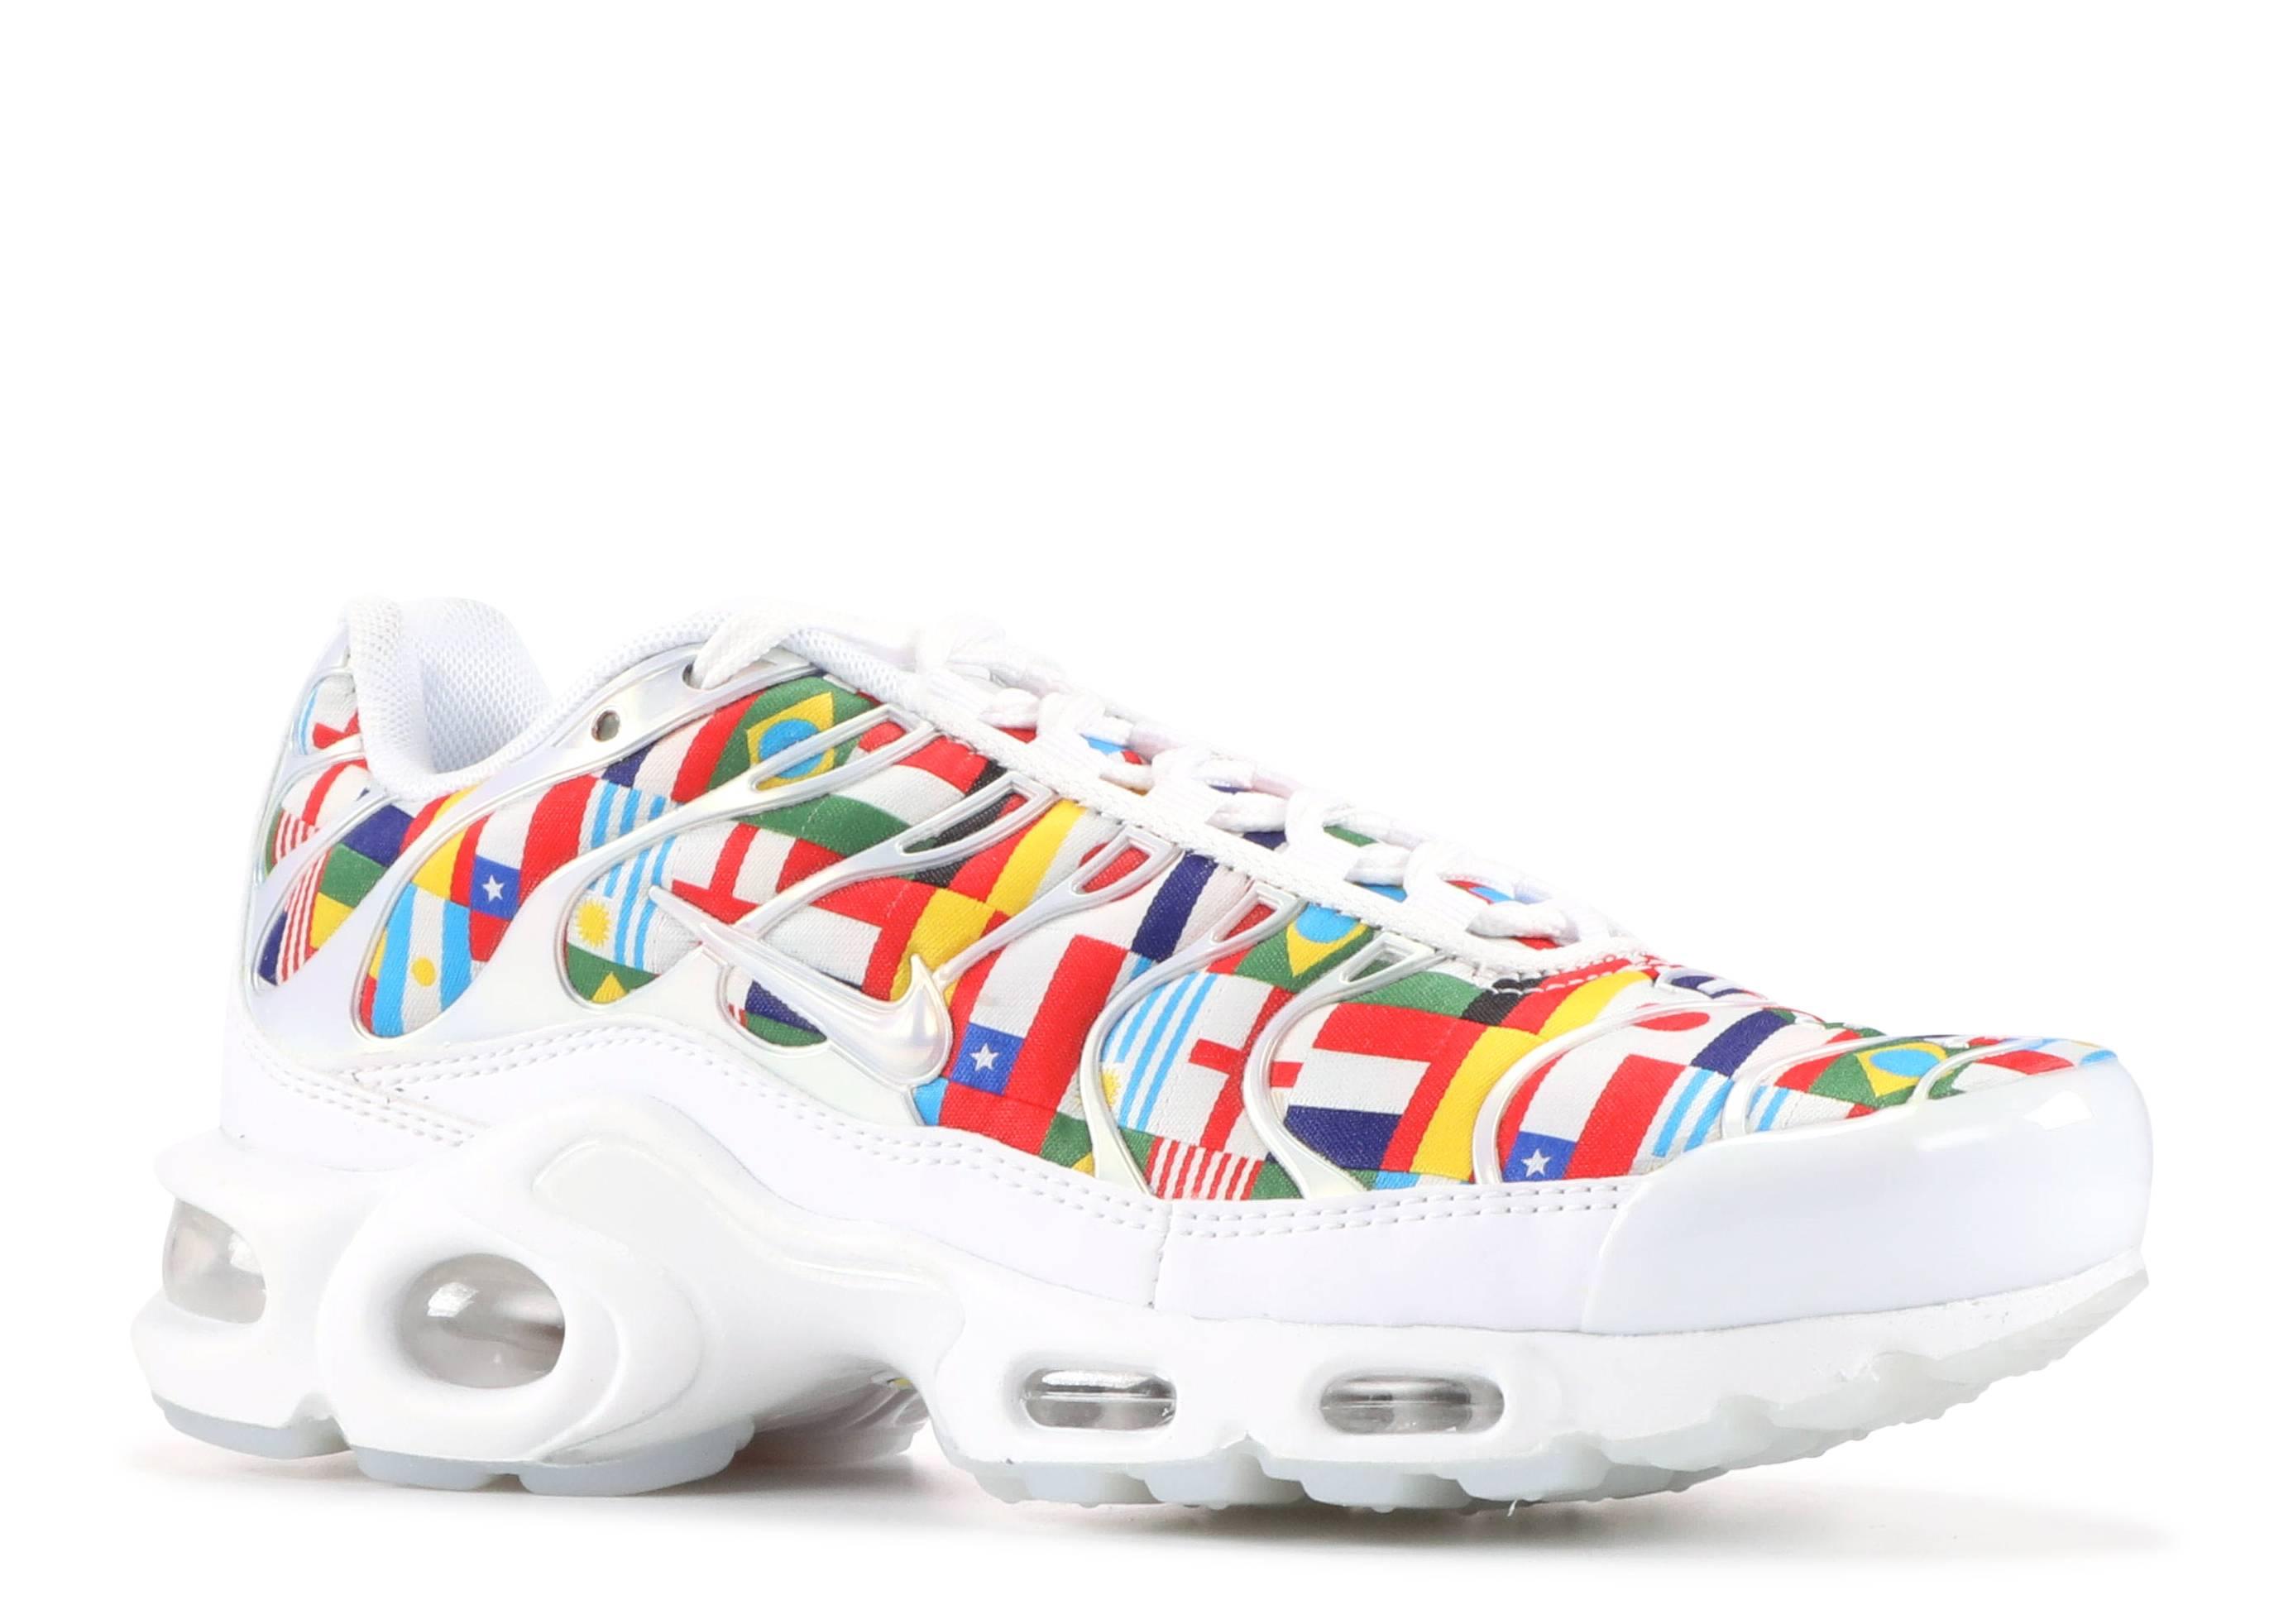 af54610da71 Air Max Plus Nic Qs - Nike - ao5117 100 - white multi-color